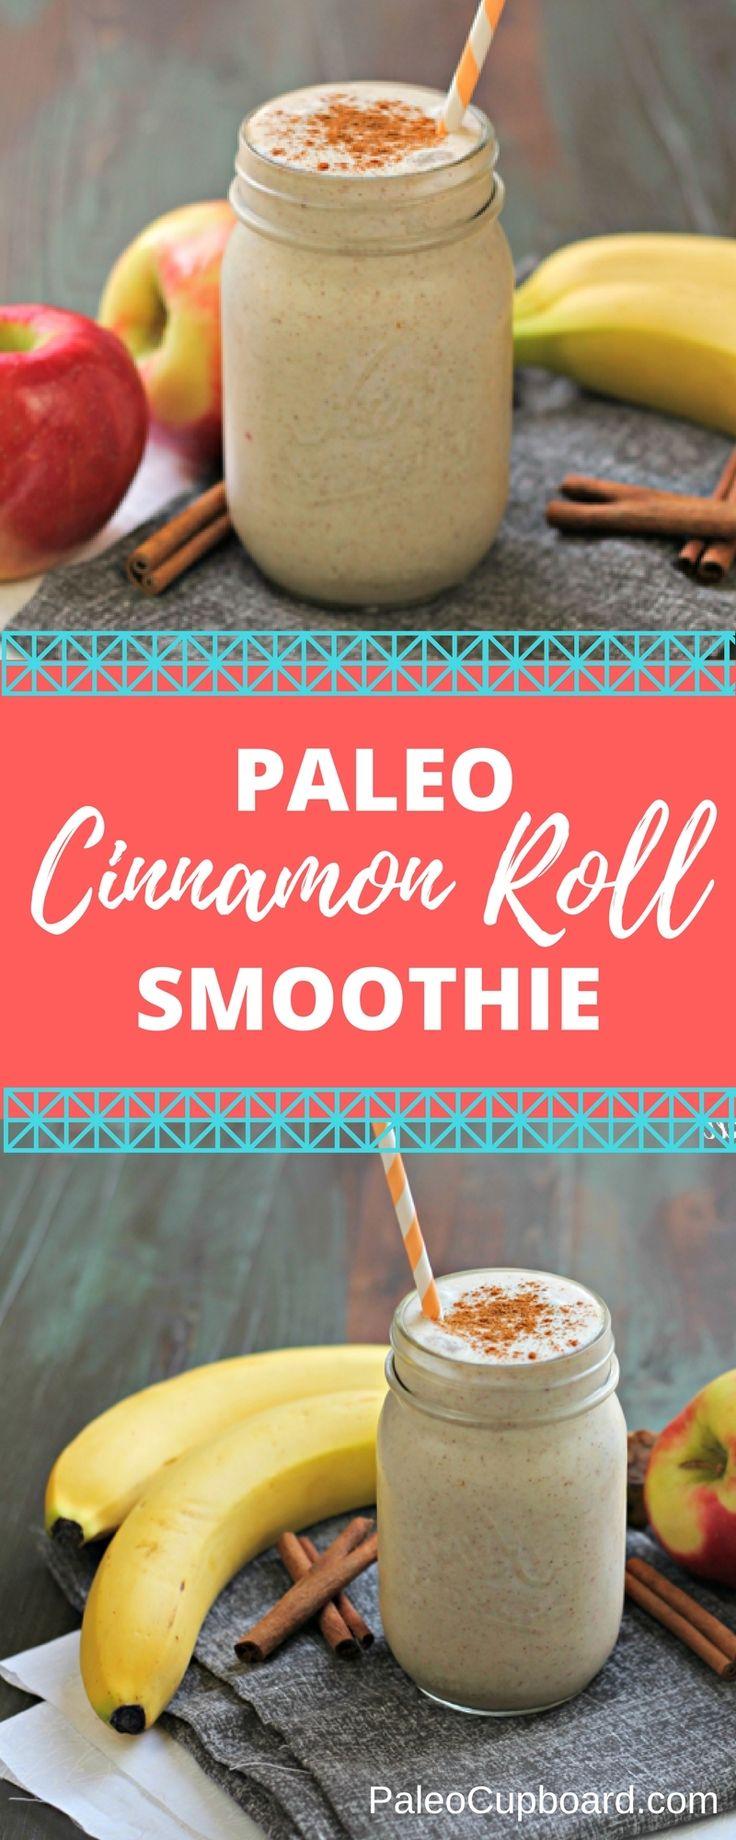 Paleo Cinnamon Roll Smoothie - PaleoCupboard.com